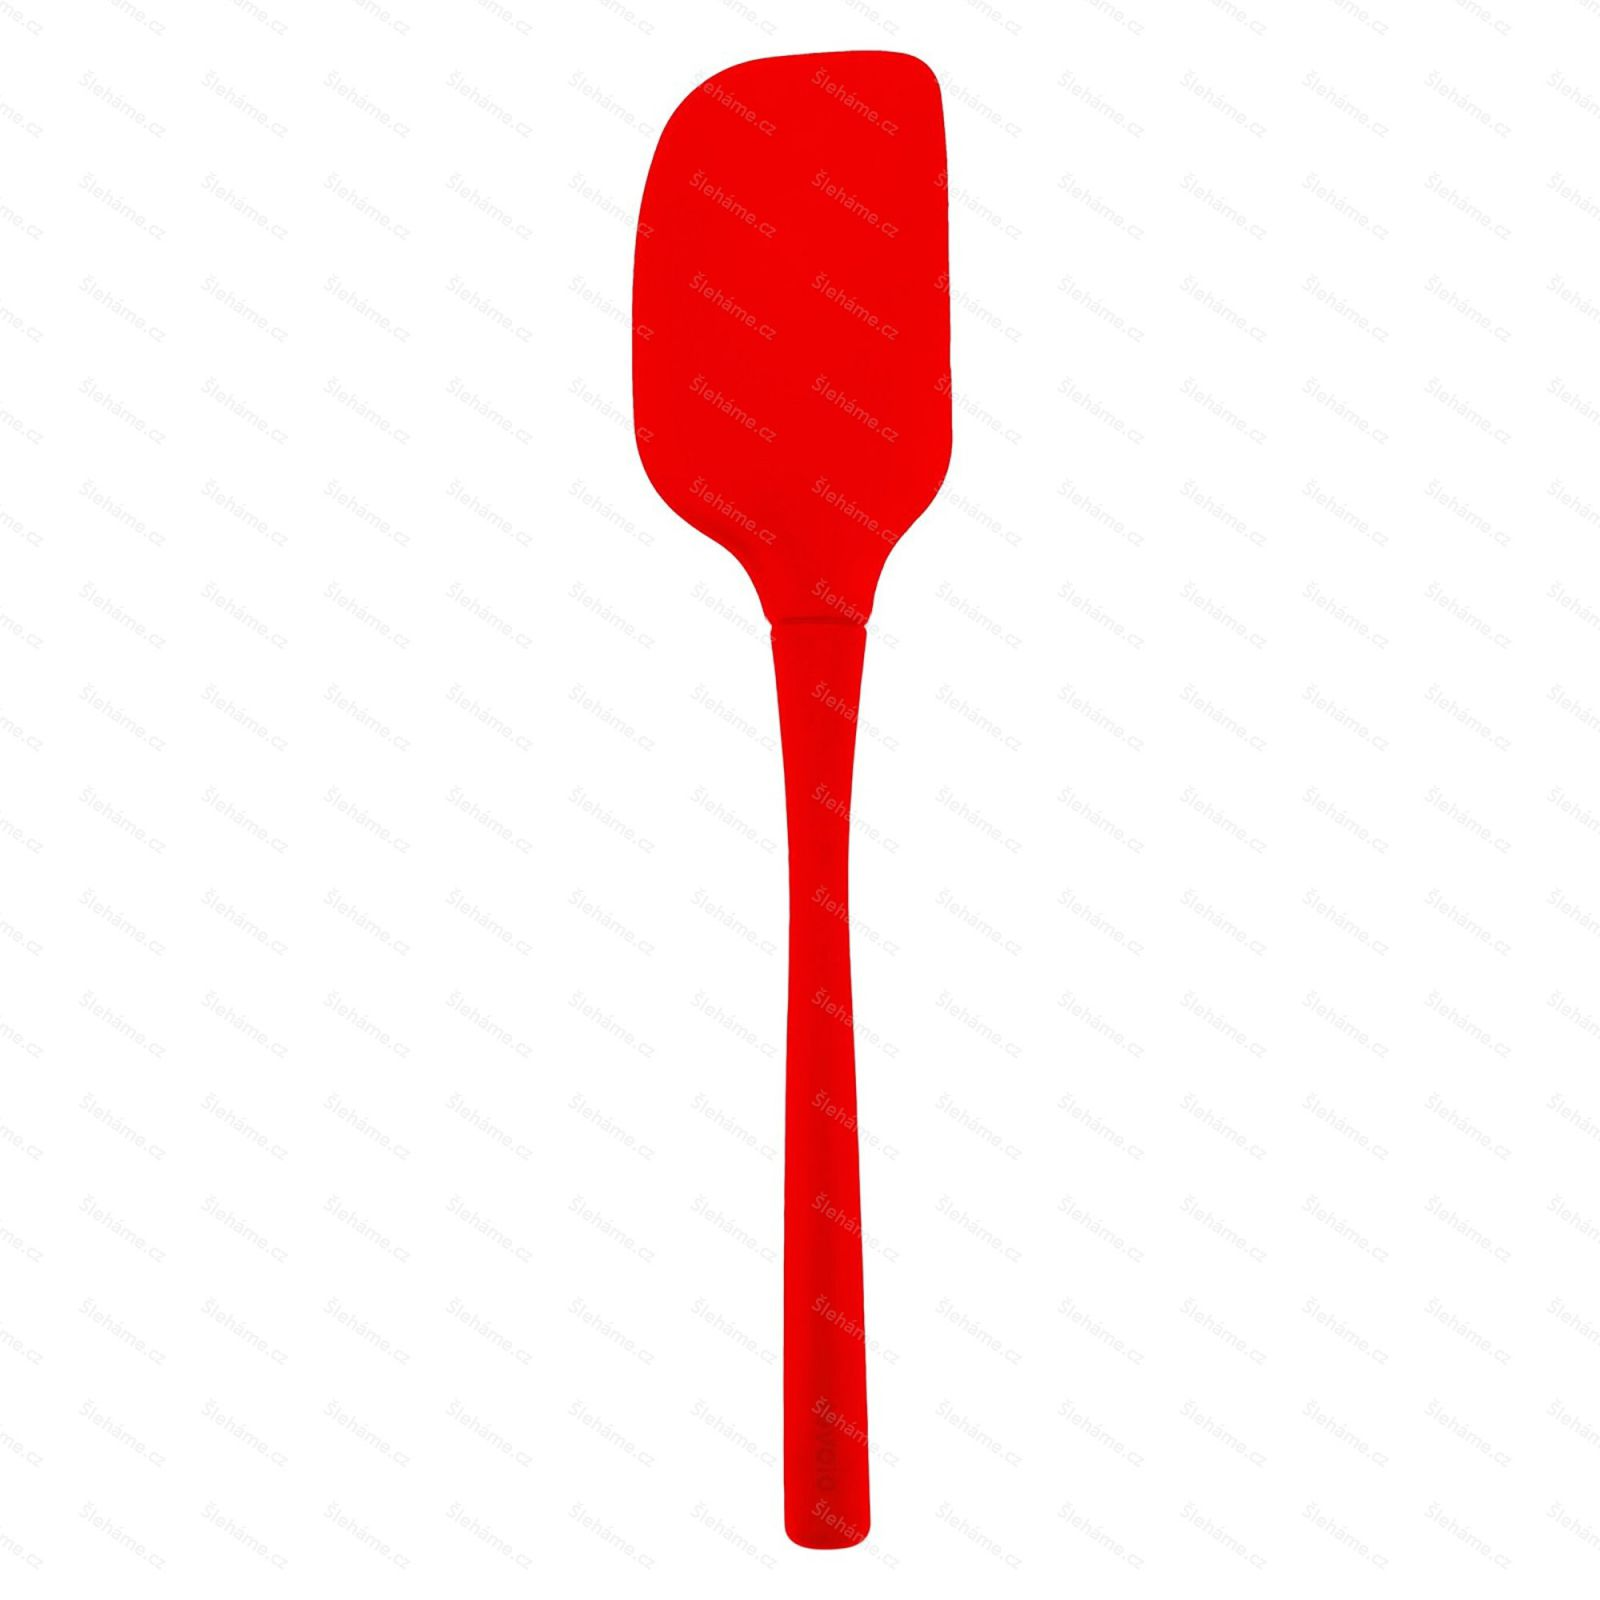 Stěrka Tovolo FLEX-CORE Jumbo, červená